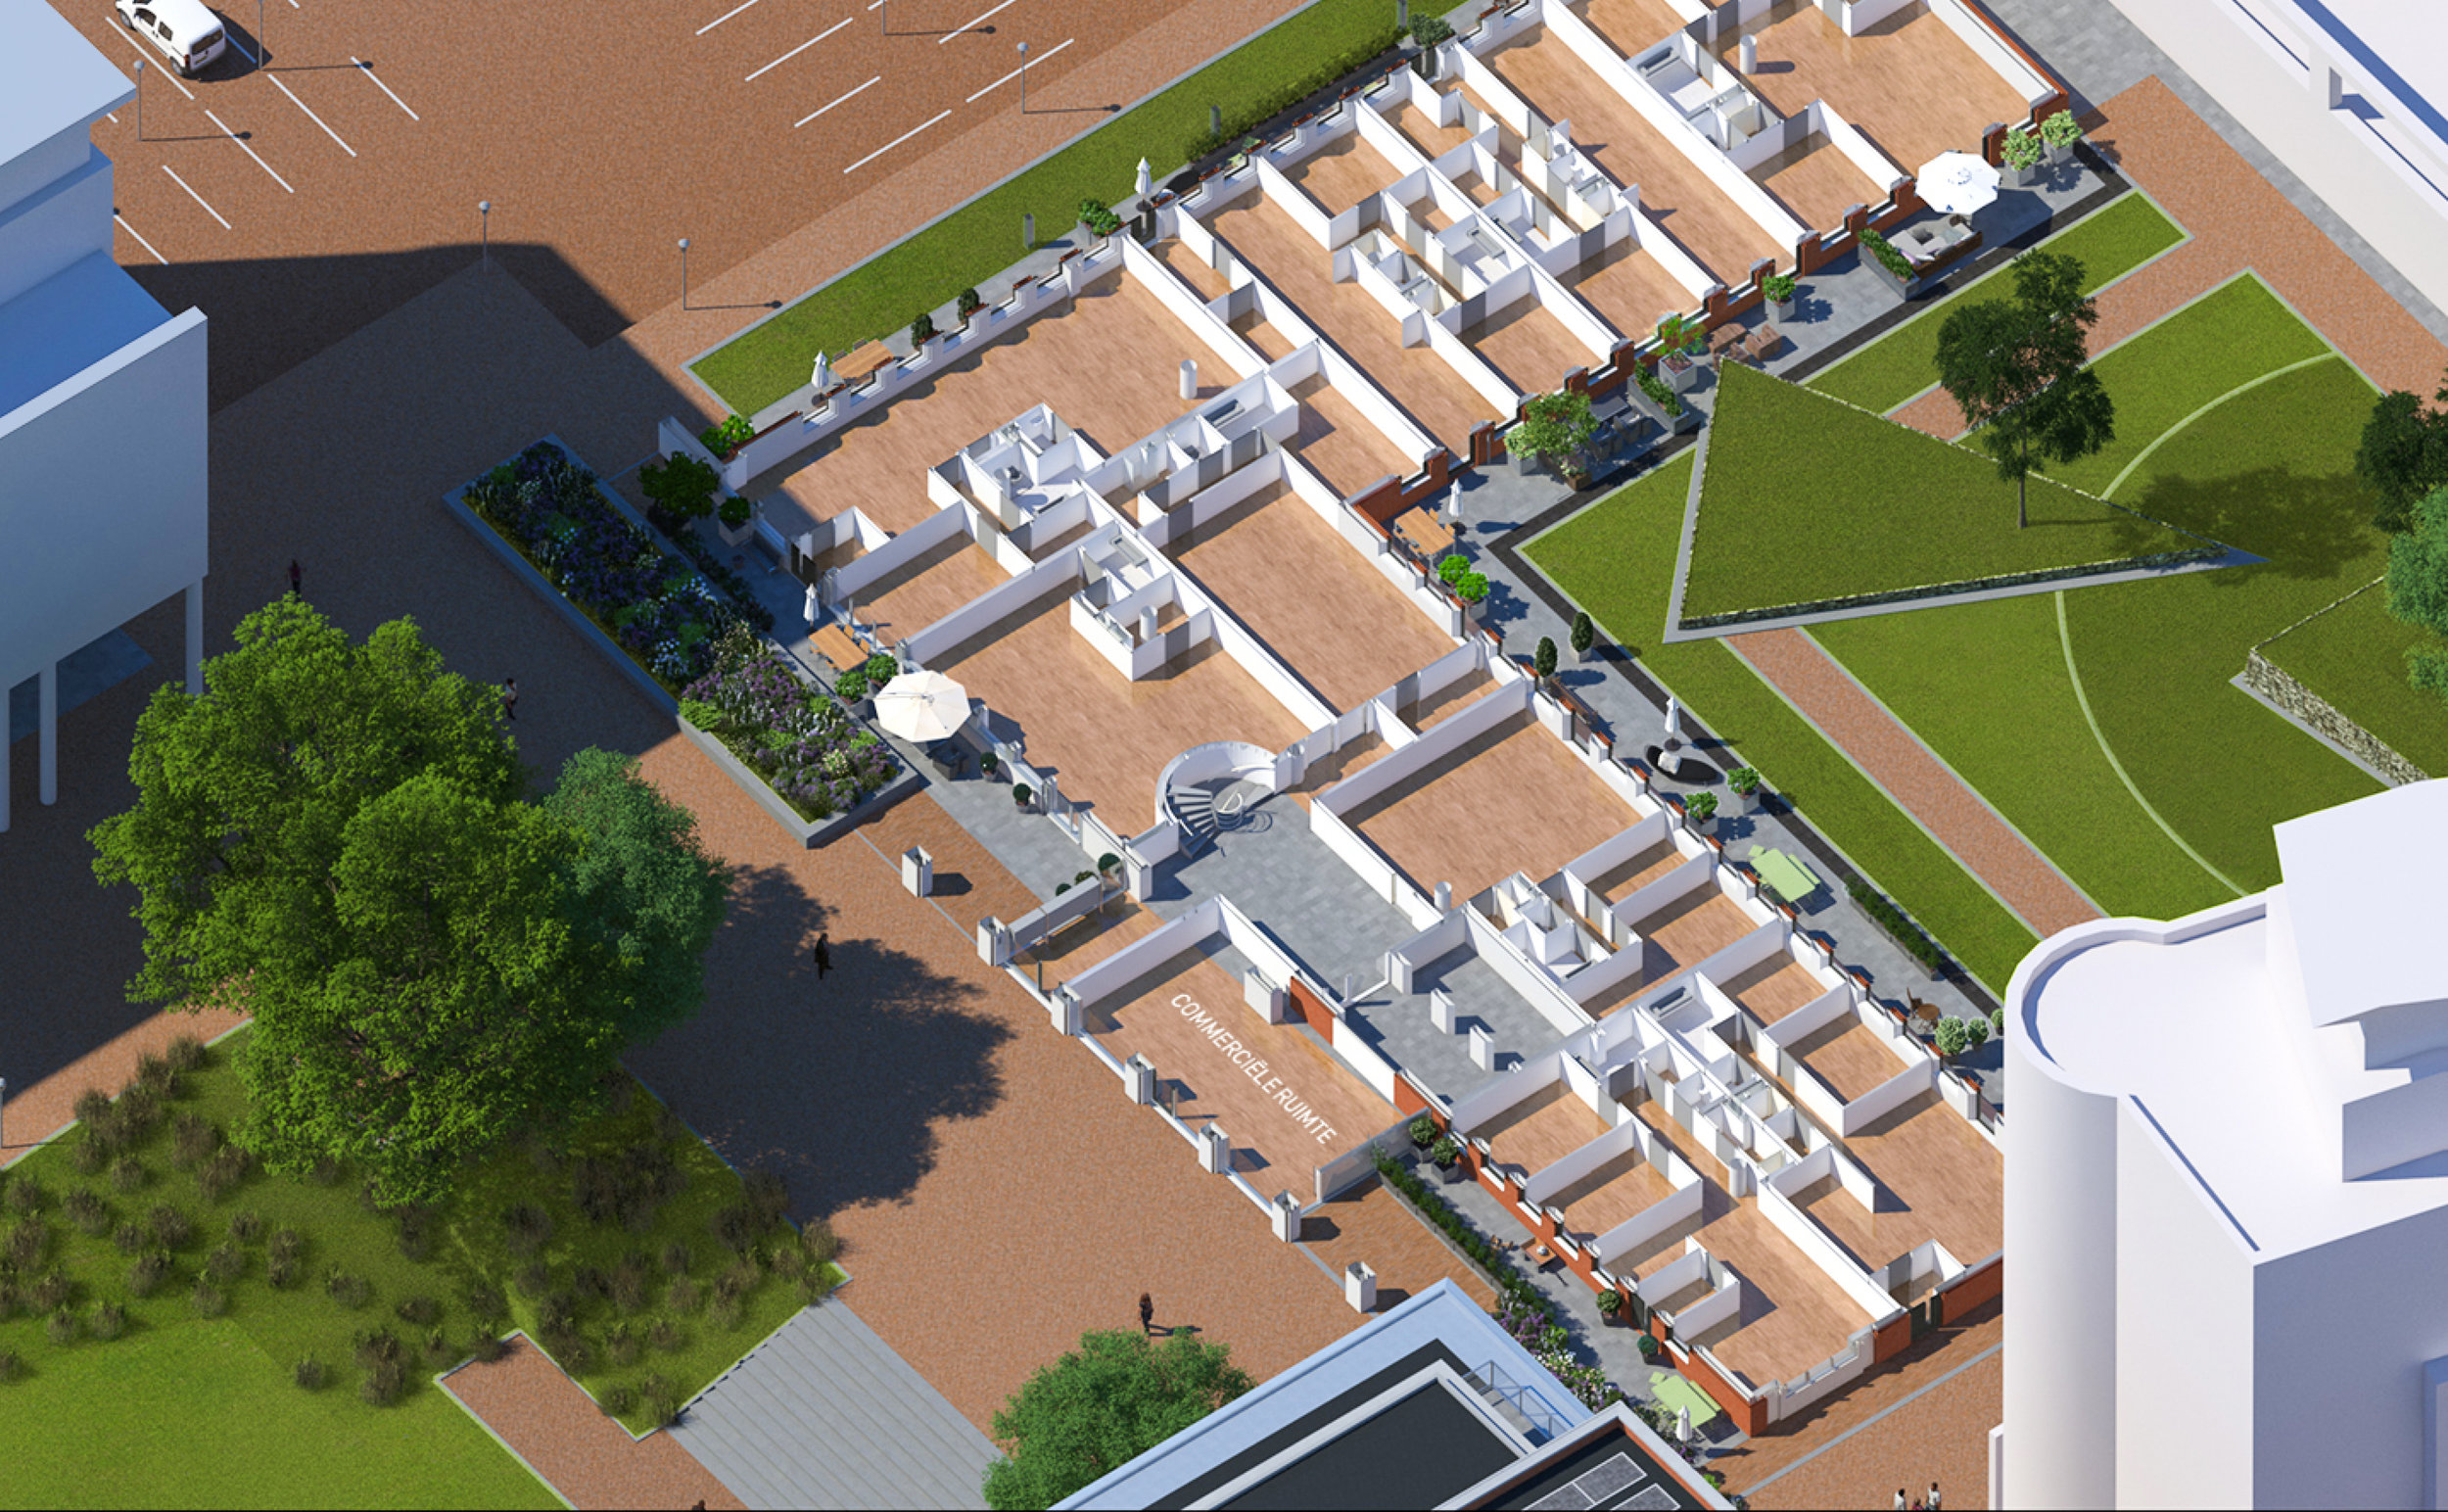 Commerciele ruimte - gebouw 6